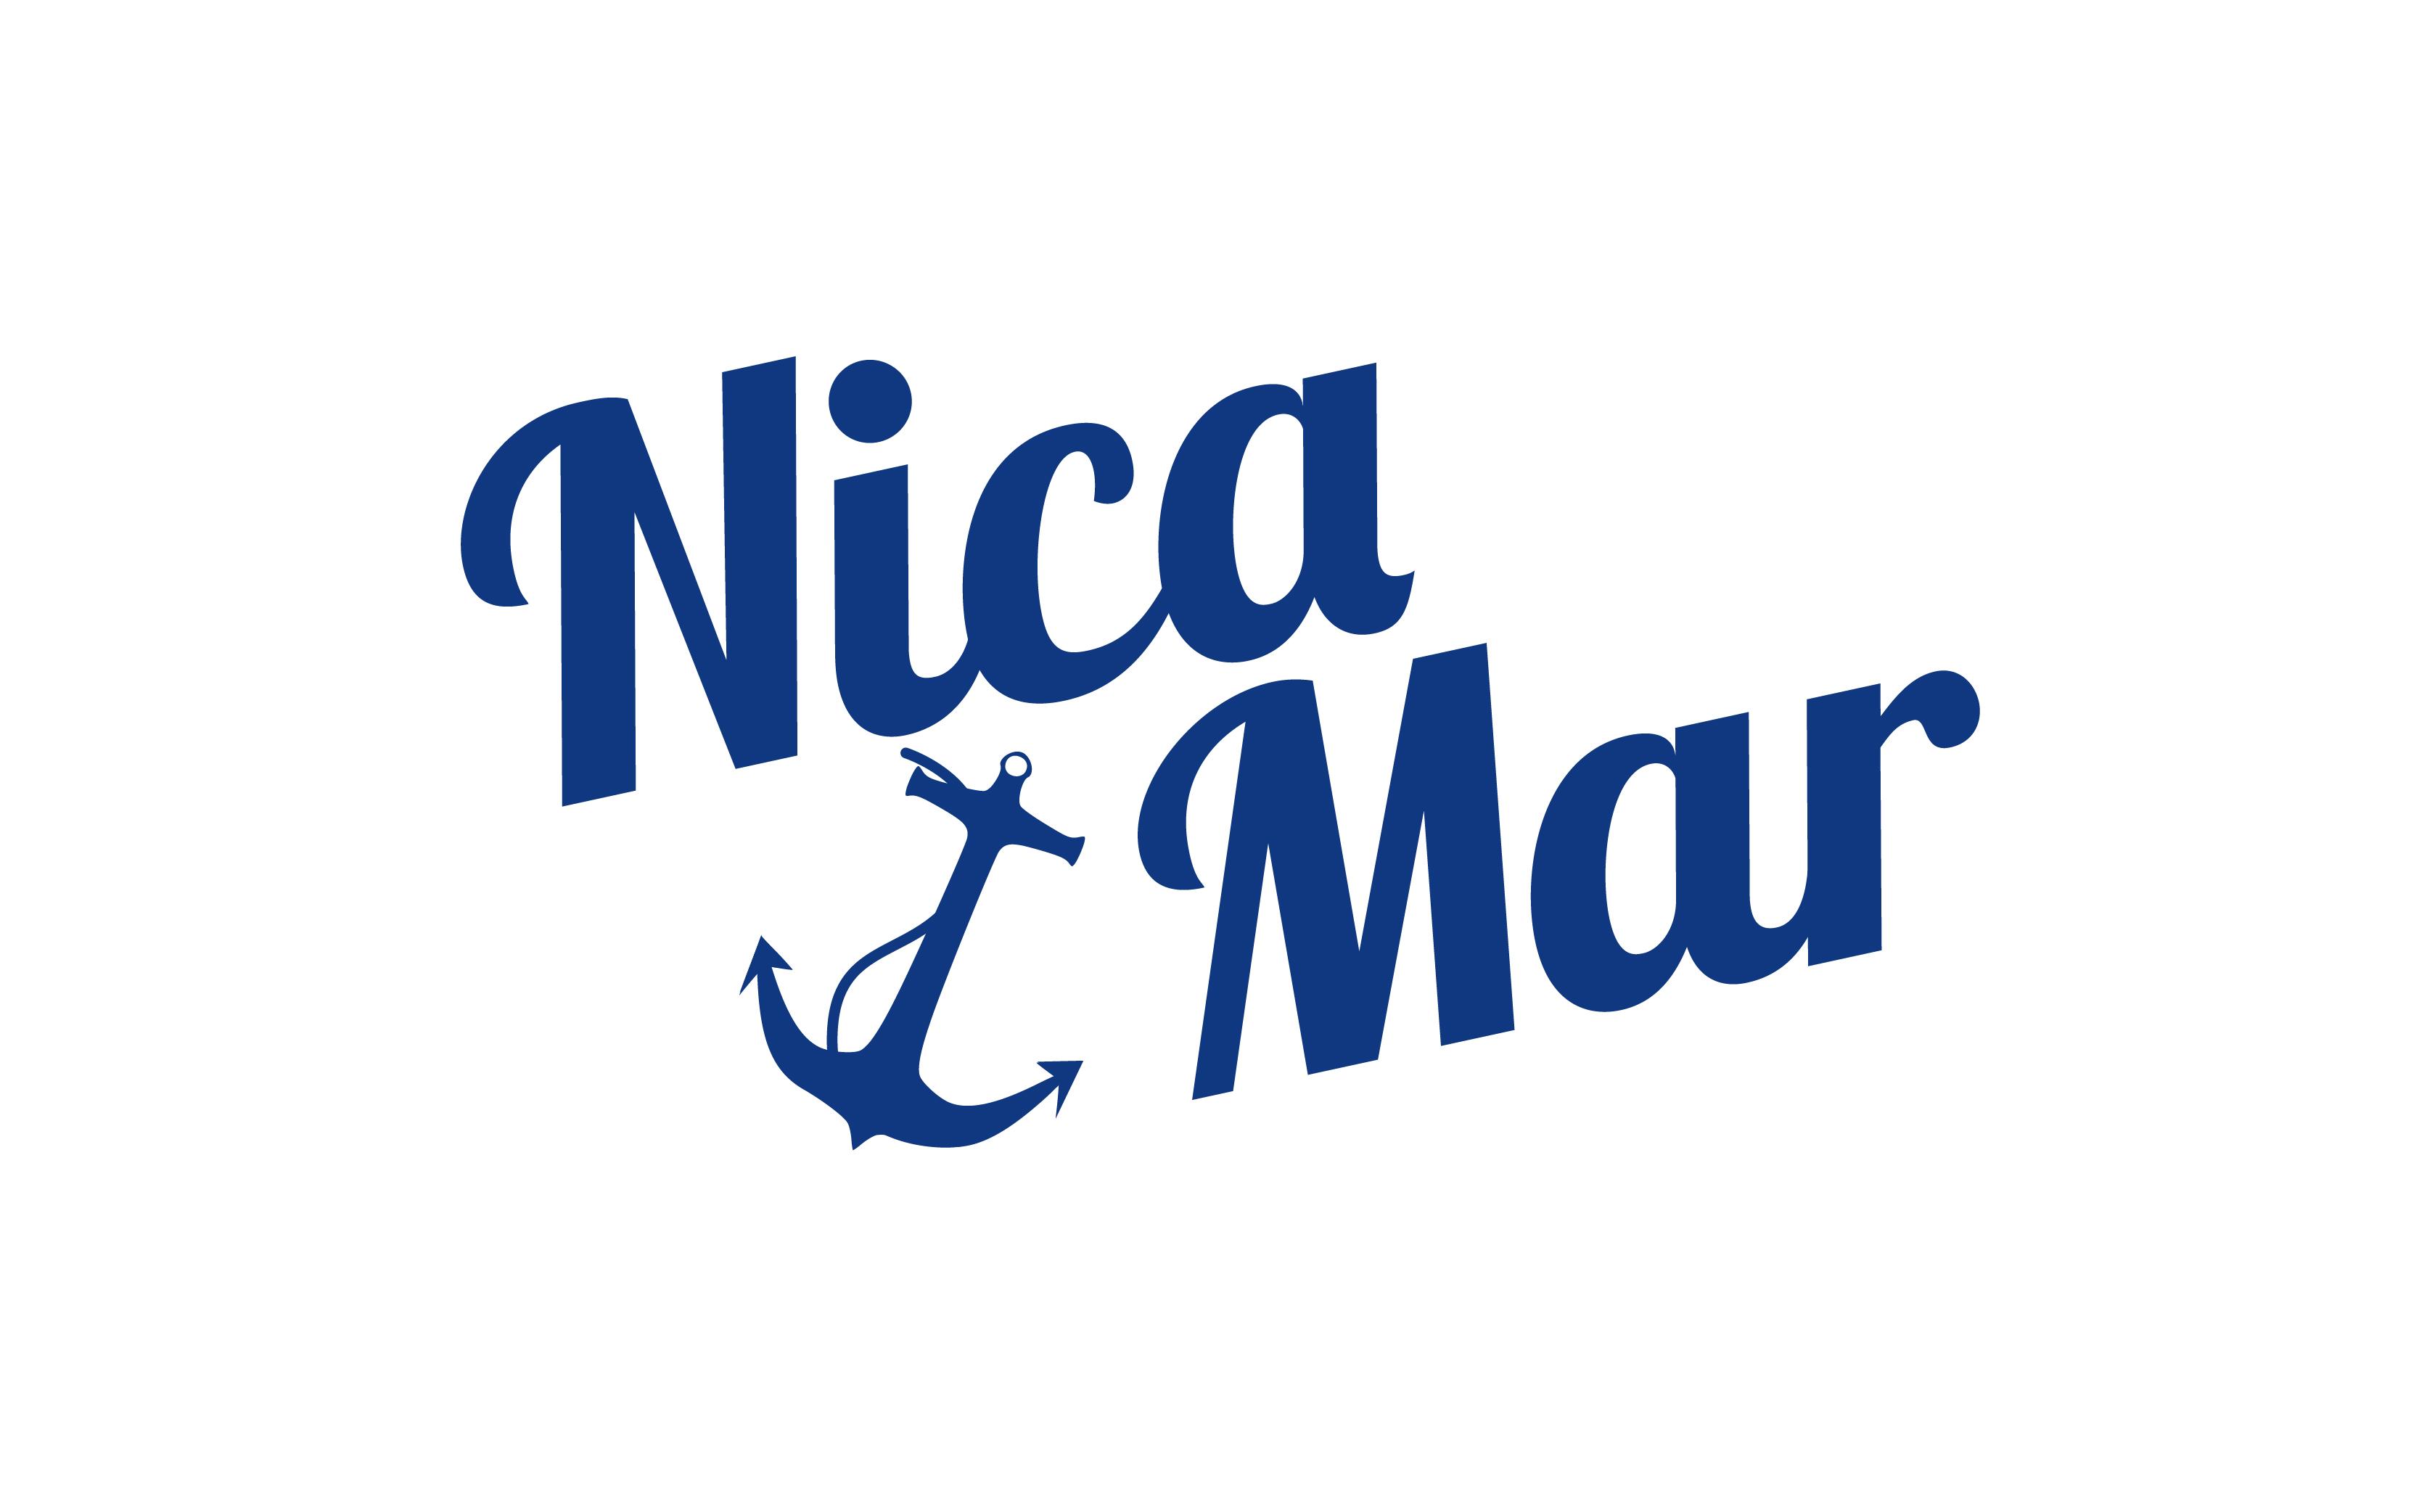 Nica-Mar